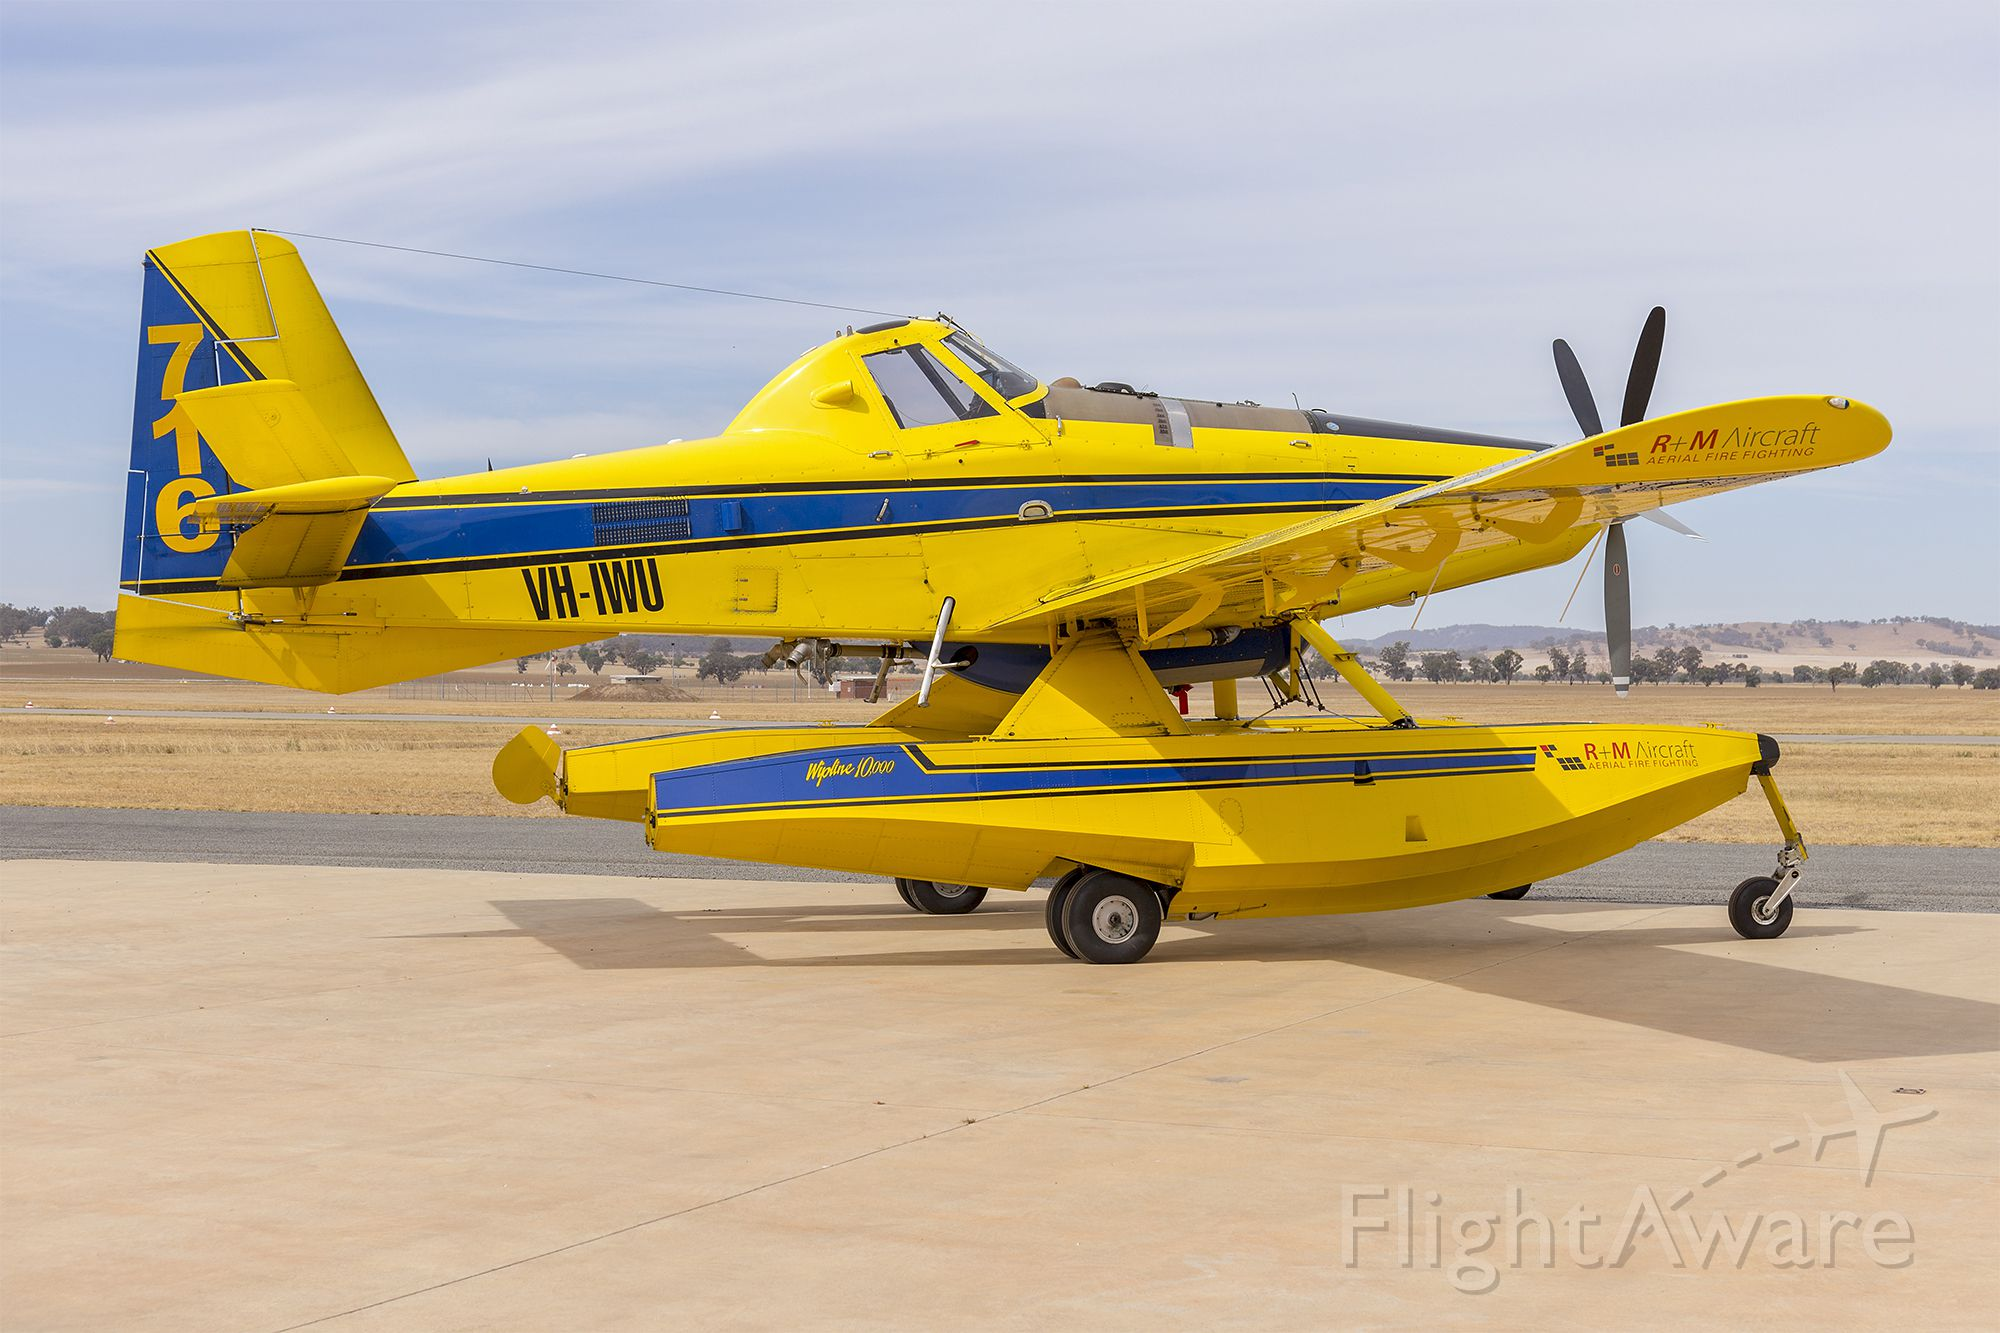 AIR TRACTOR Fire Boss (VH-IWU) - R+M Aircraft (VH-IWU) Air Tractor AT802F Fire Boss at Wagga Wagga Airport